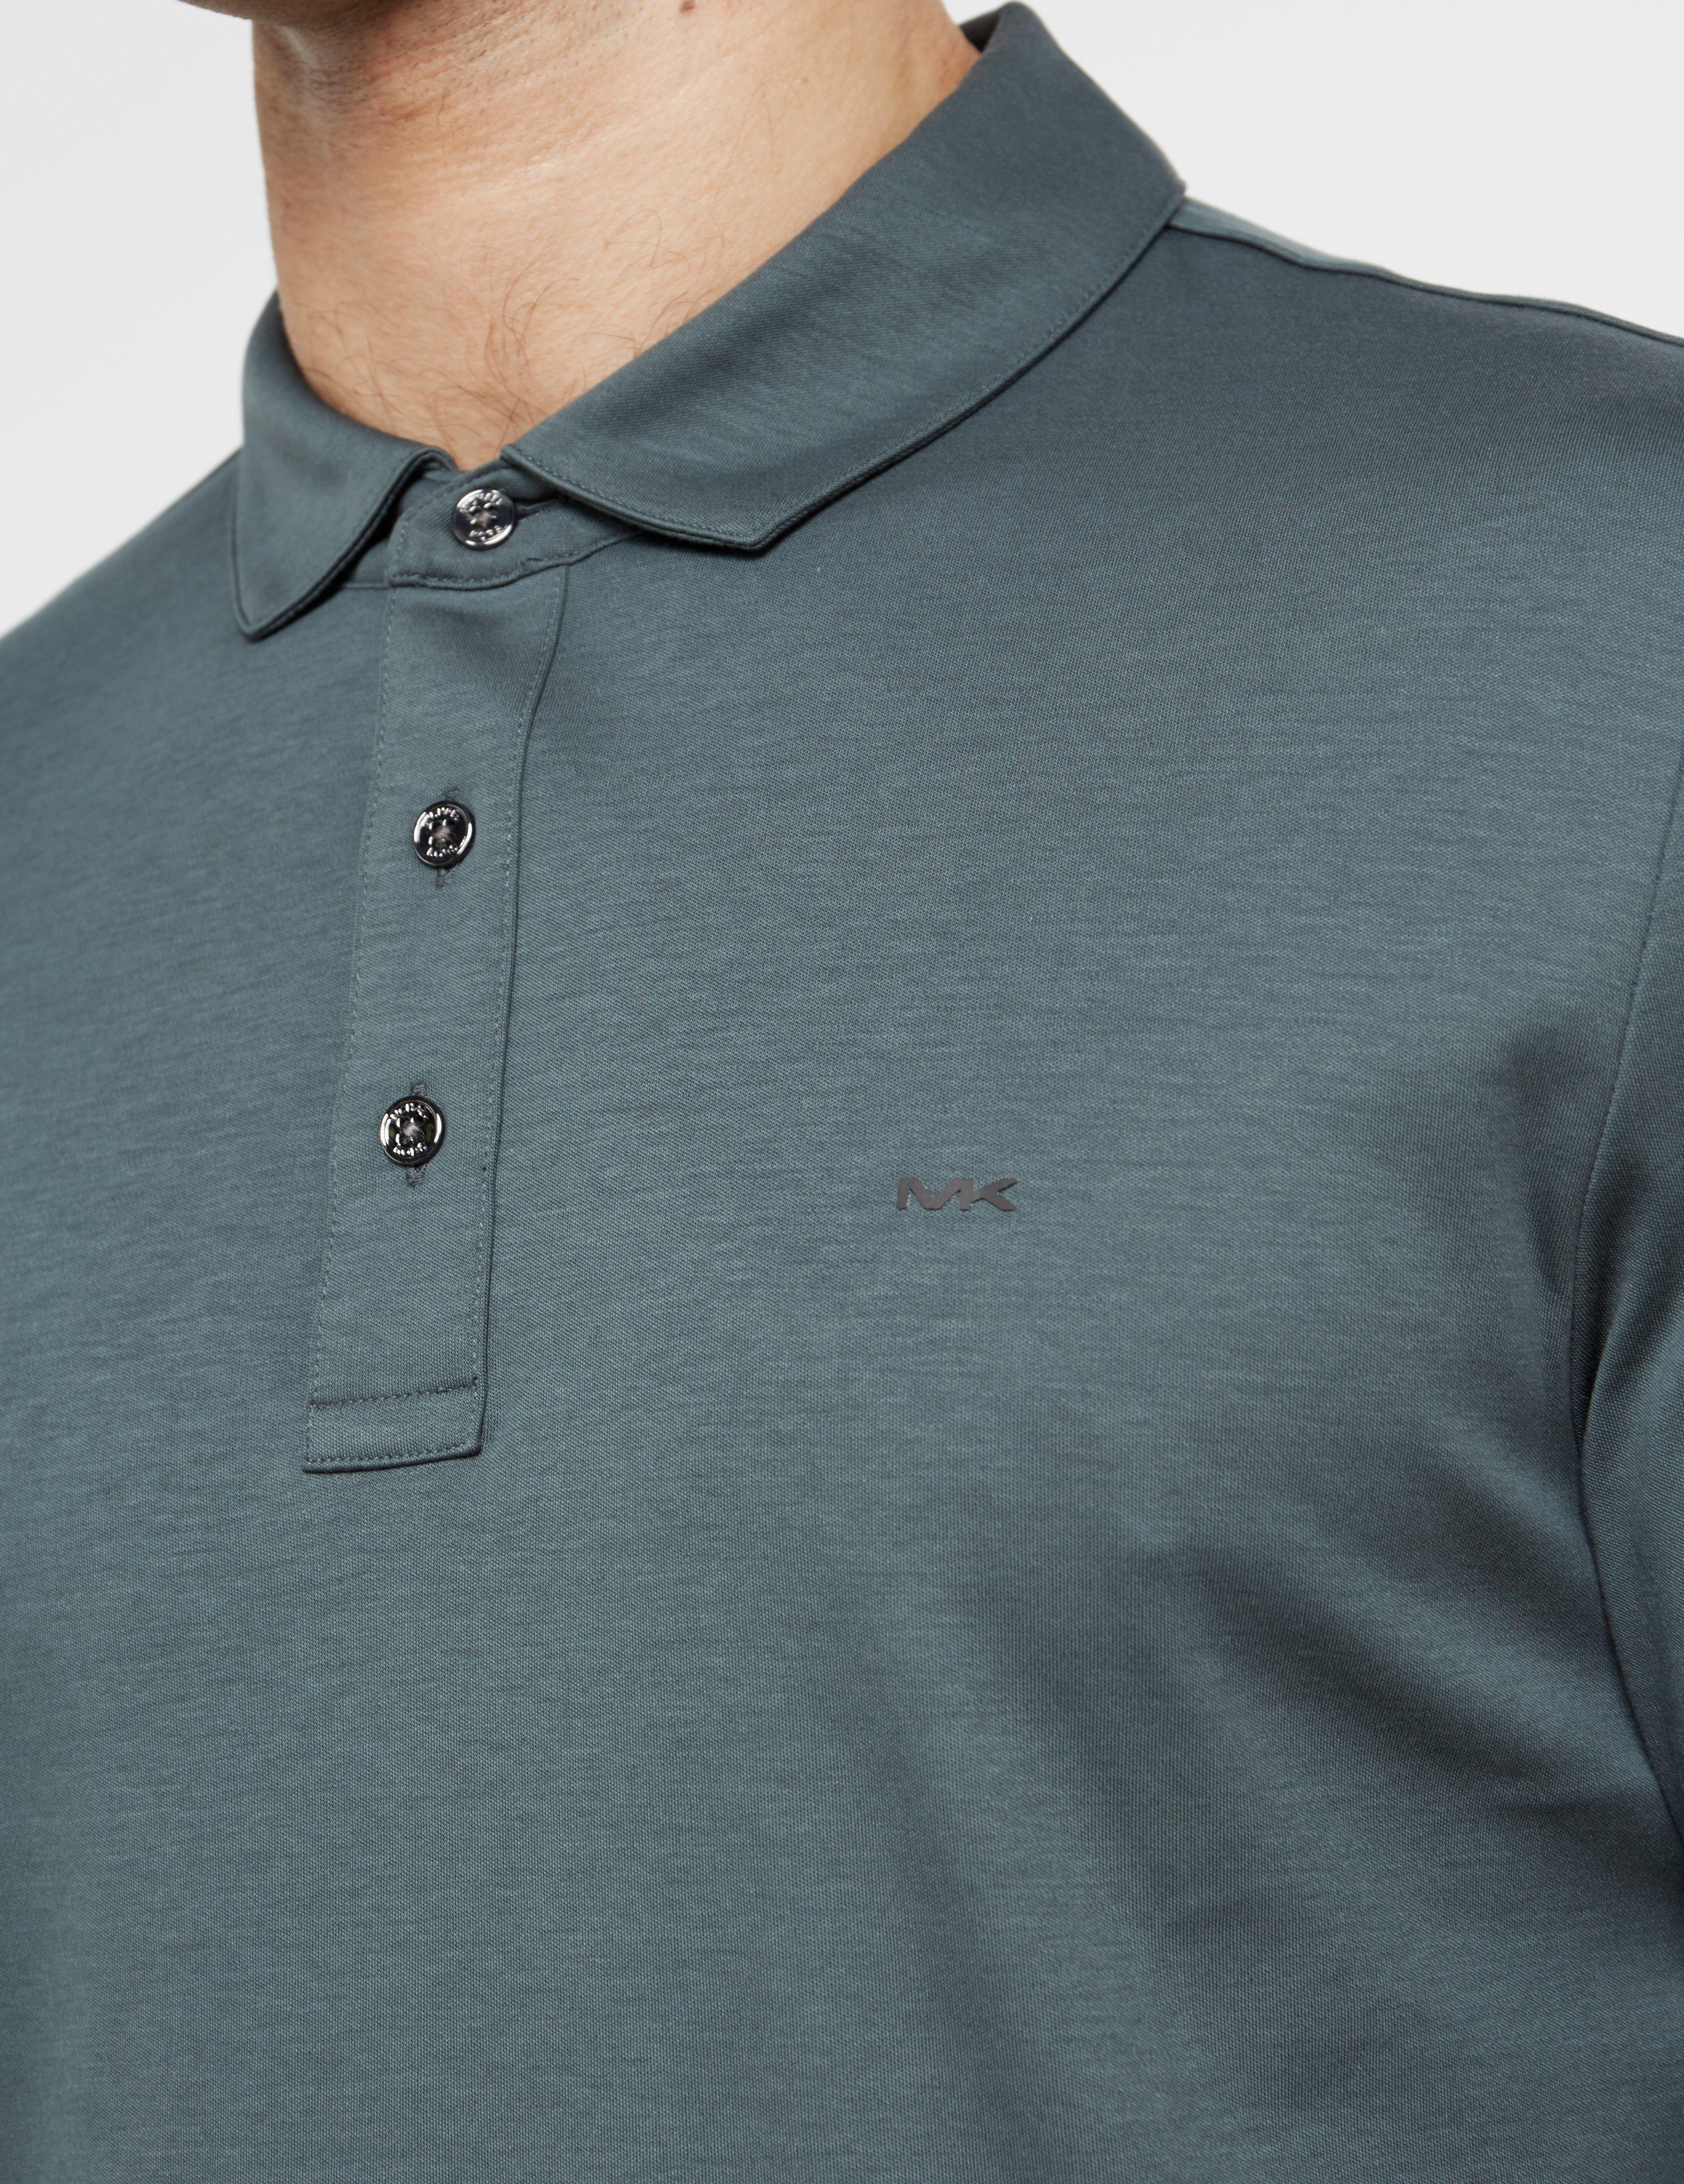 6c5de5ba Michael Kors - Mens Sleek Long Sleeve Polo Shirt Green for Men - Lyst. View  fullscreen